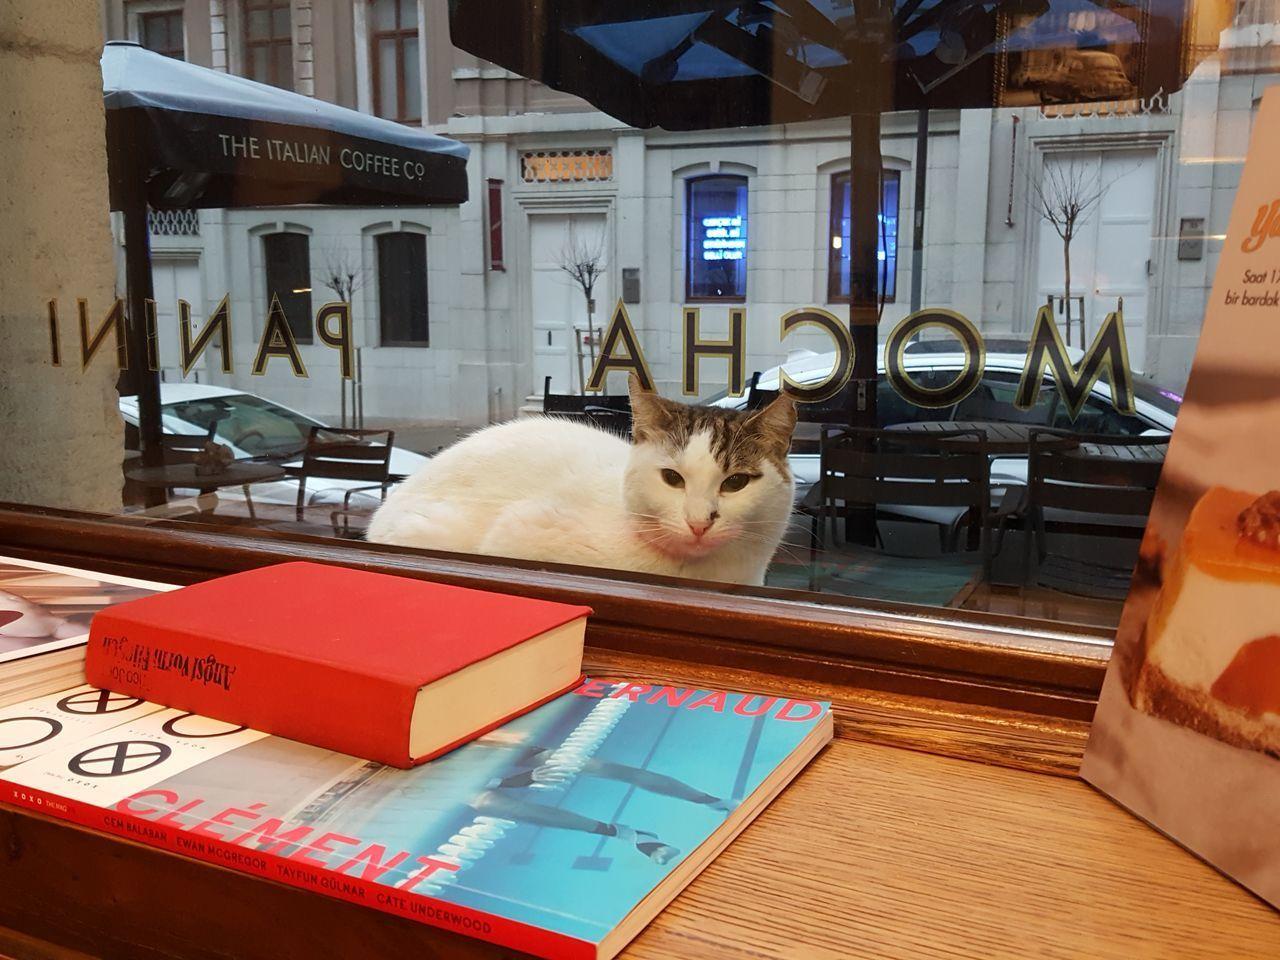 Pets Domestic Cat Domestic Animals Animal Themes Cat EyeEmCatlovers EyeEm Cat Cats Of EyeEm